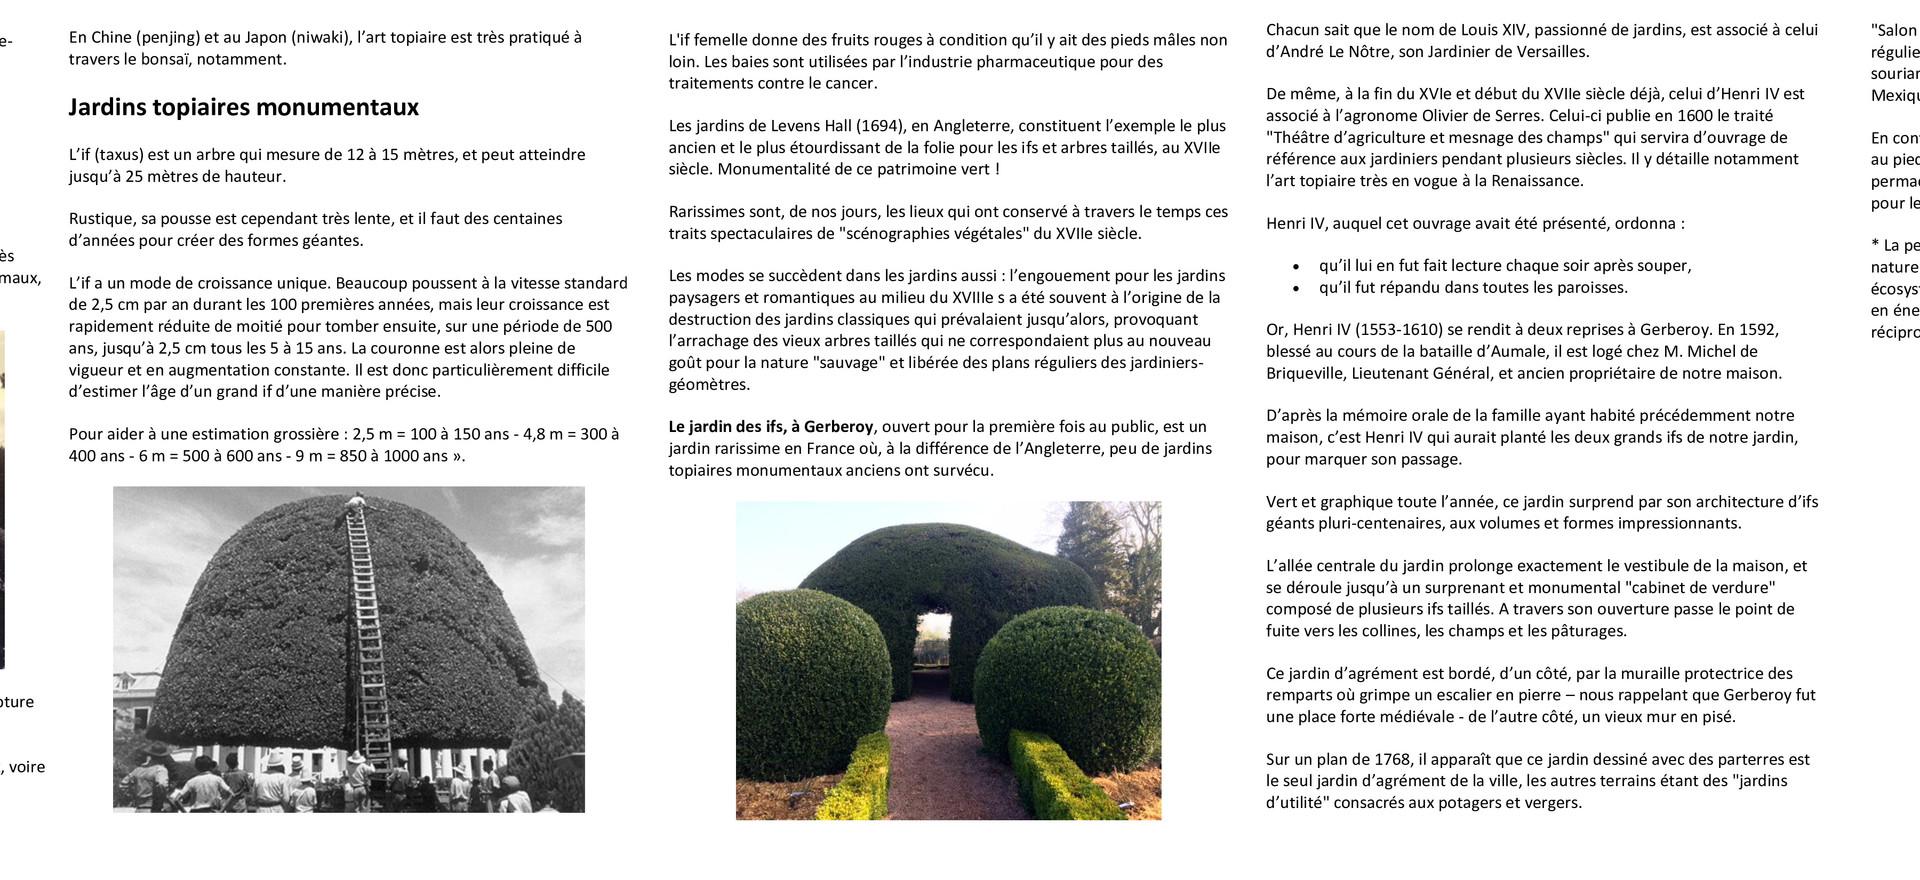 binatte et jardin 2016.jpg